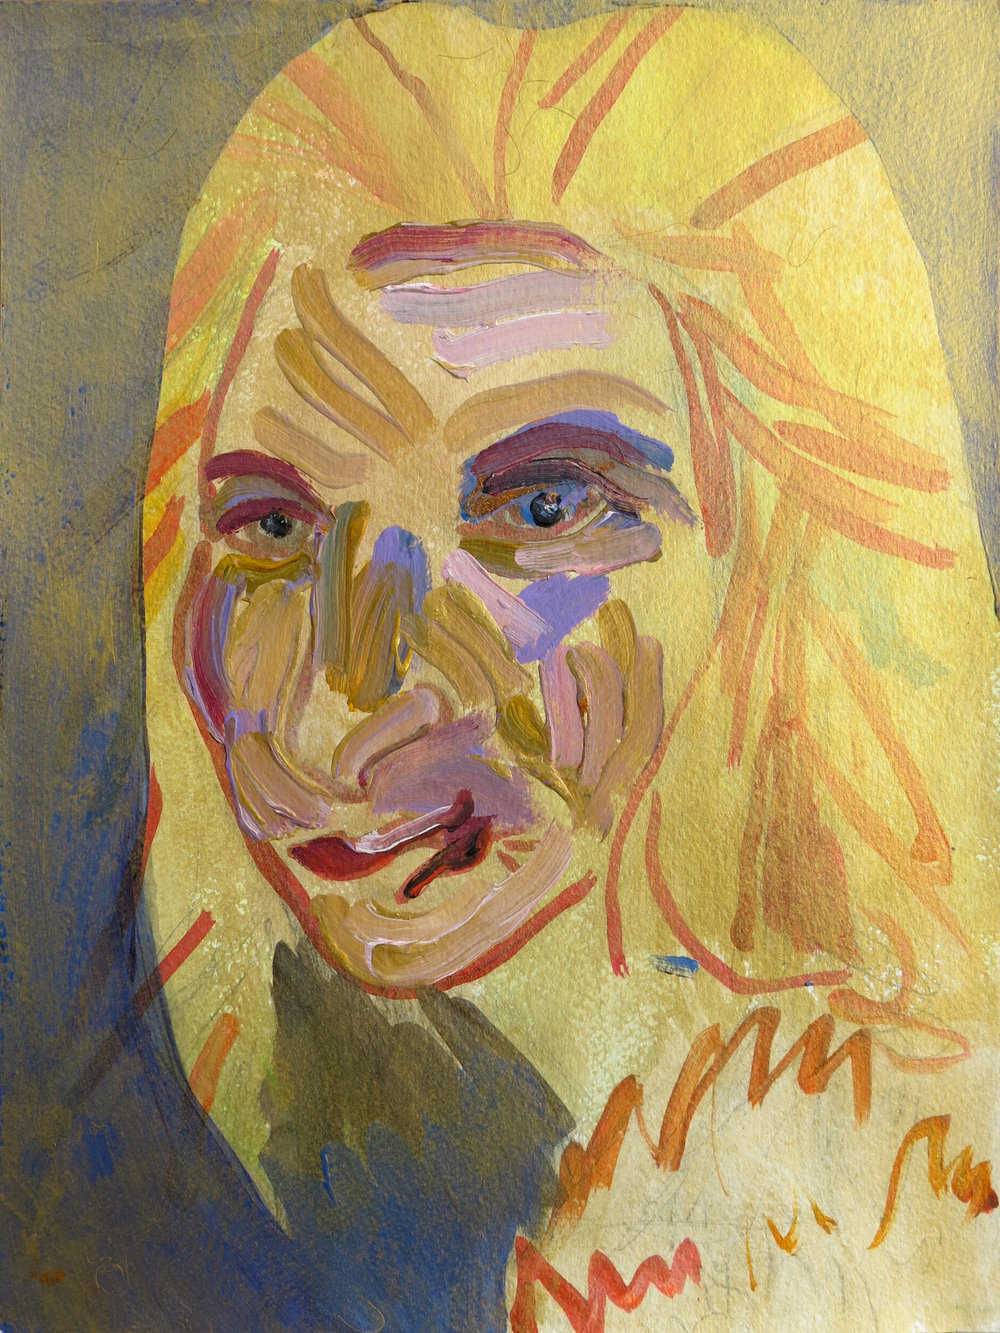 Barbra Streisand Portrait #86